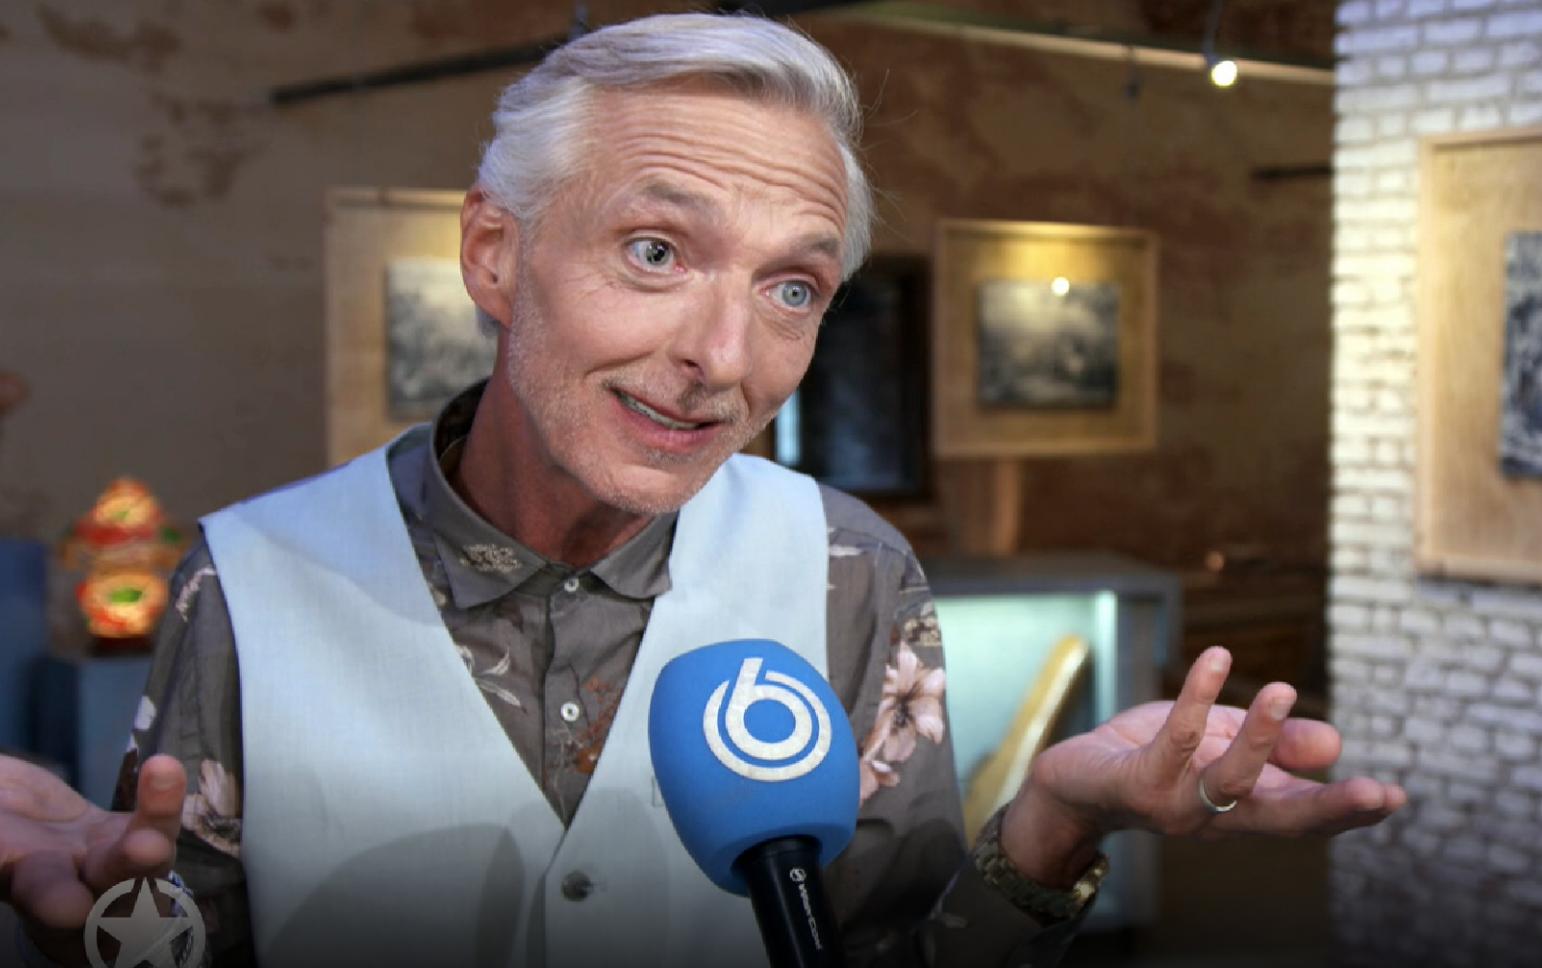 Oorlog: Martien Meiland Weigert Frank & Rogier In Kasteel